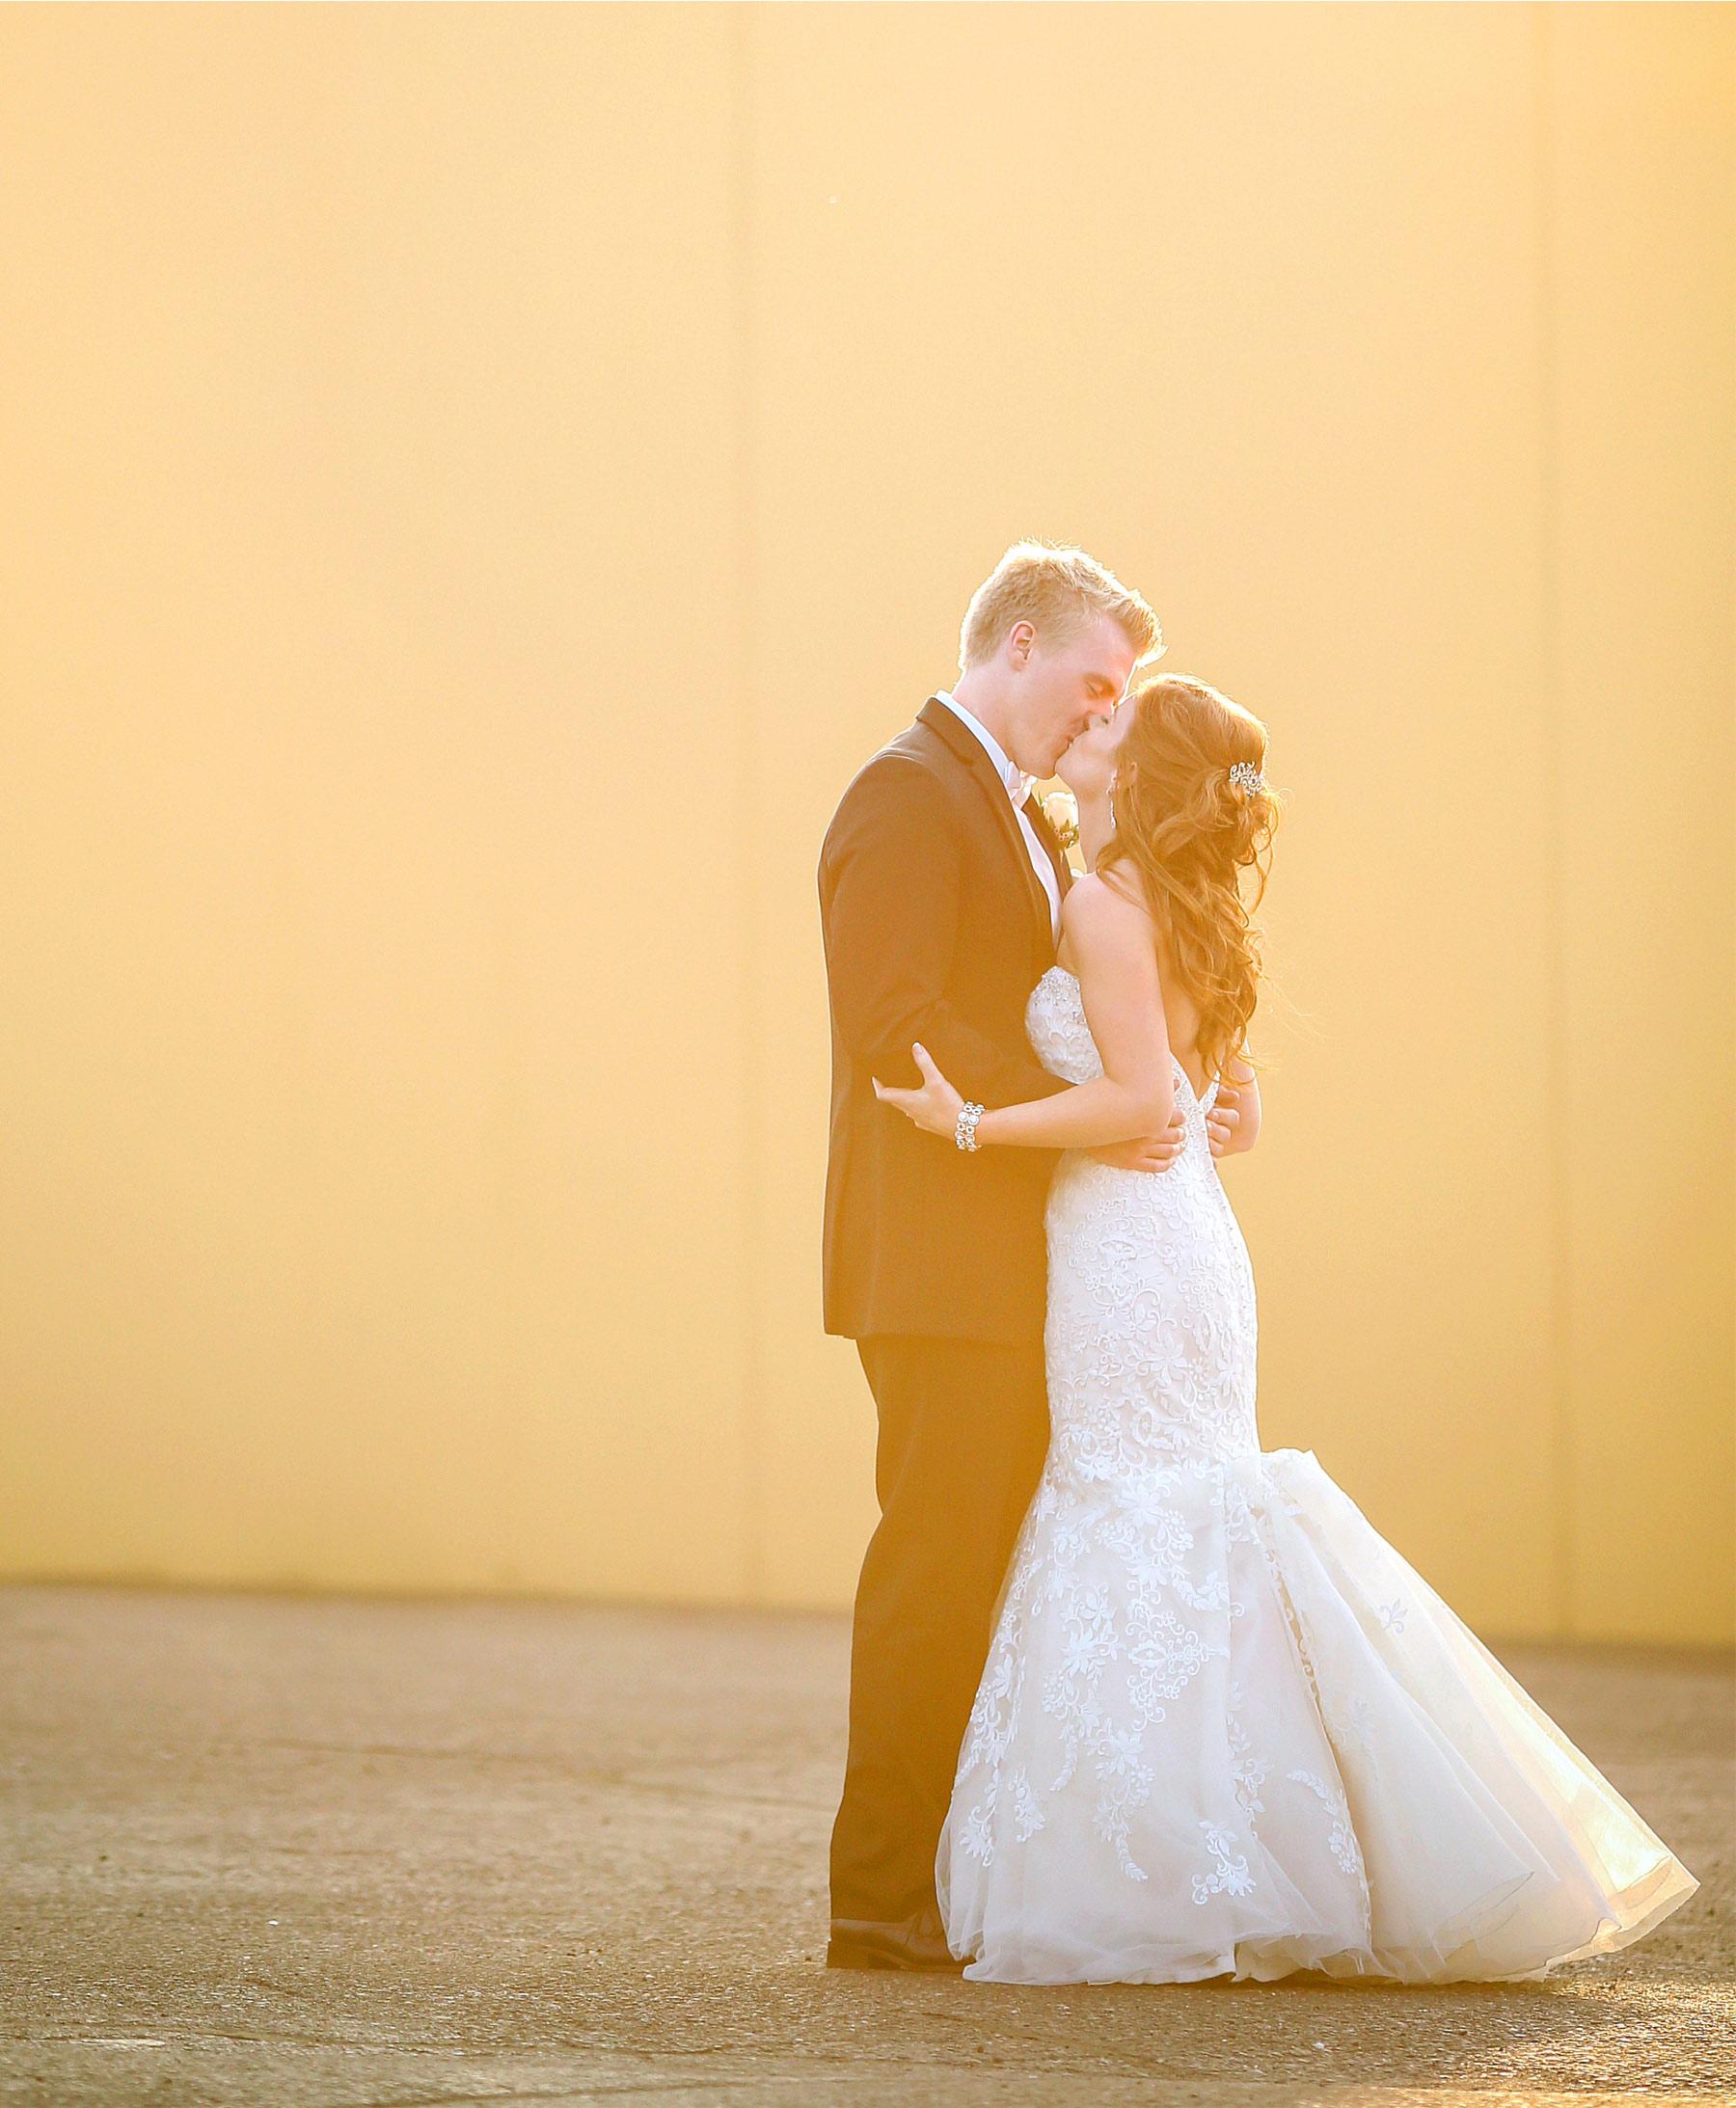 13-Minneapolis-Minnesota-Wedding-Photography-by-Vick-Photography-Golden-Hour-Tianna-&-Matt.jpg